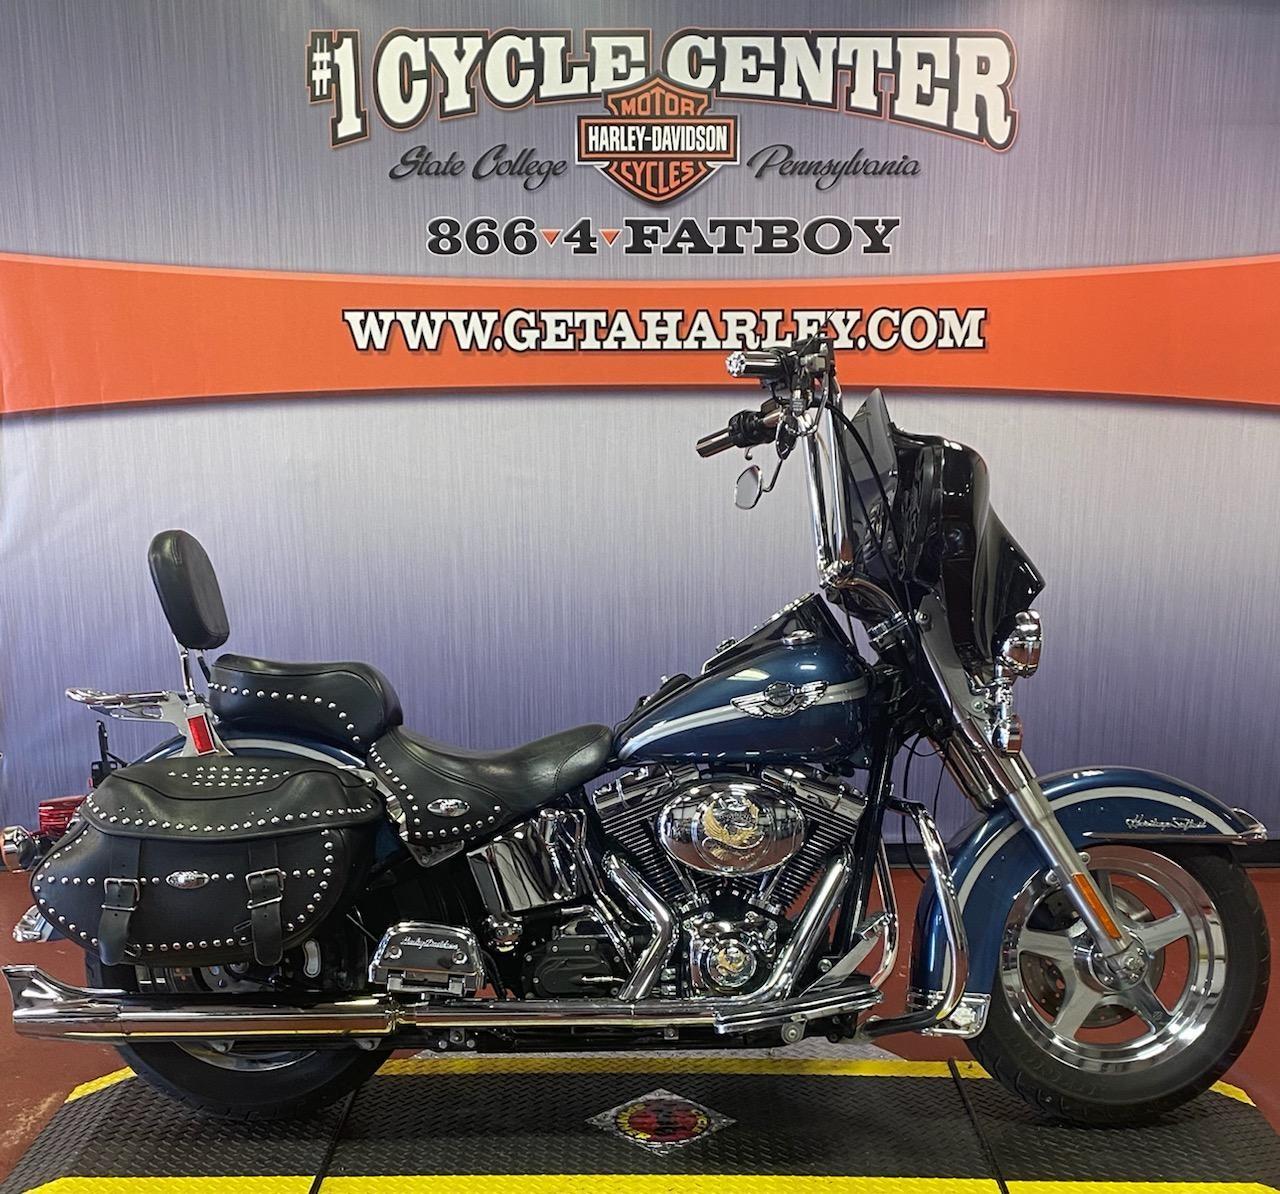 2003 Harley-Davidson FLSTC at #1 Cycle Center Harley-Davidson